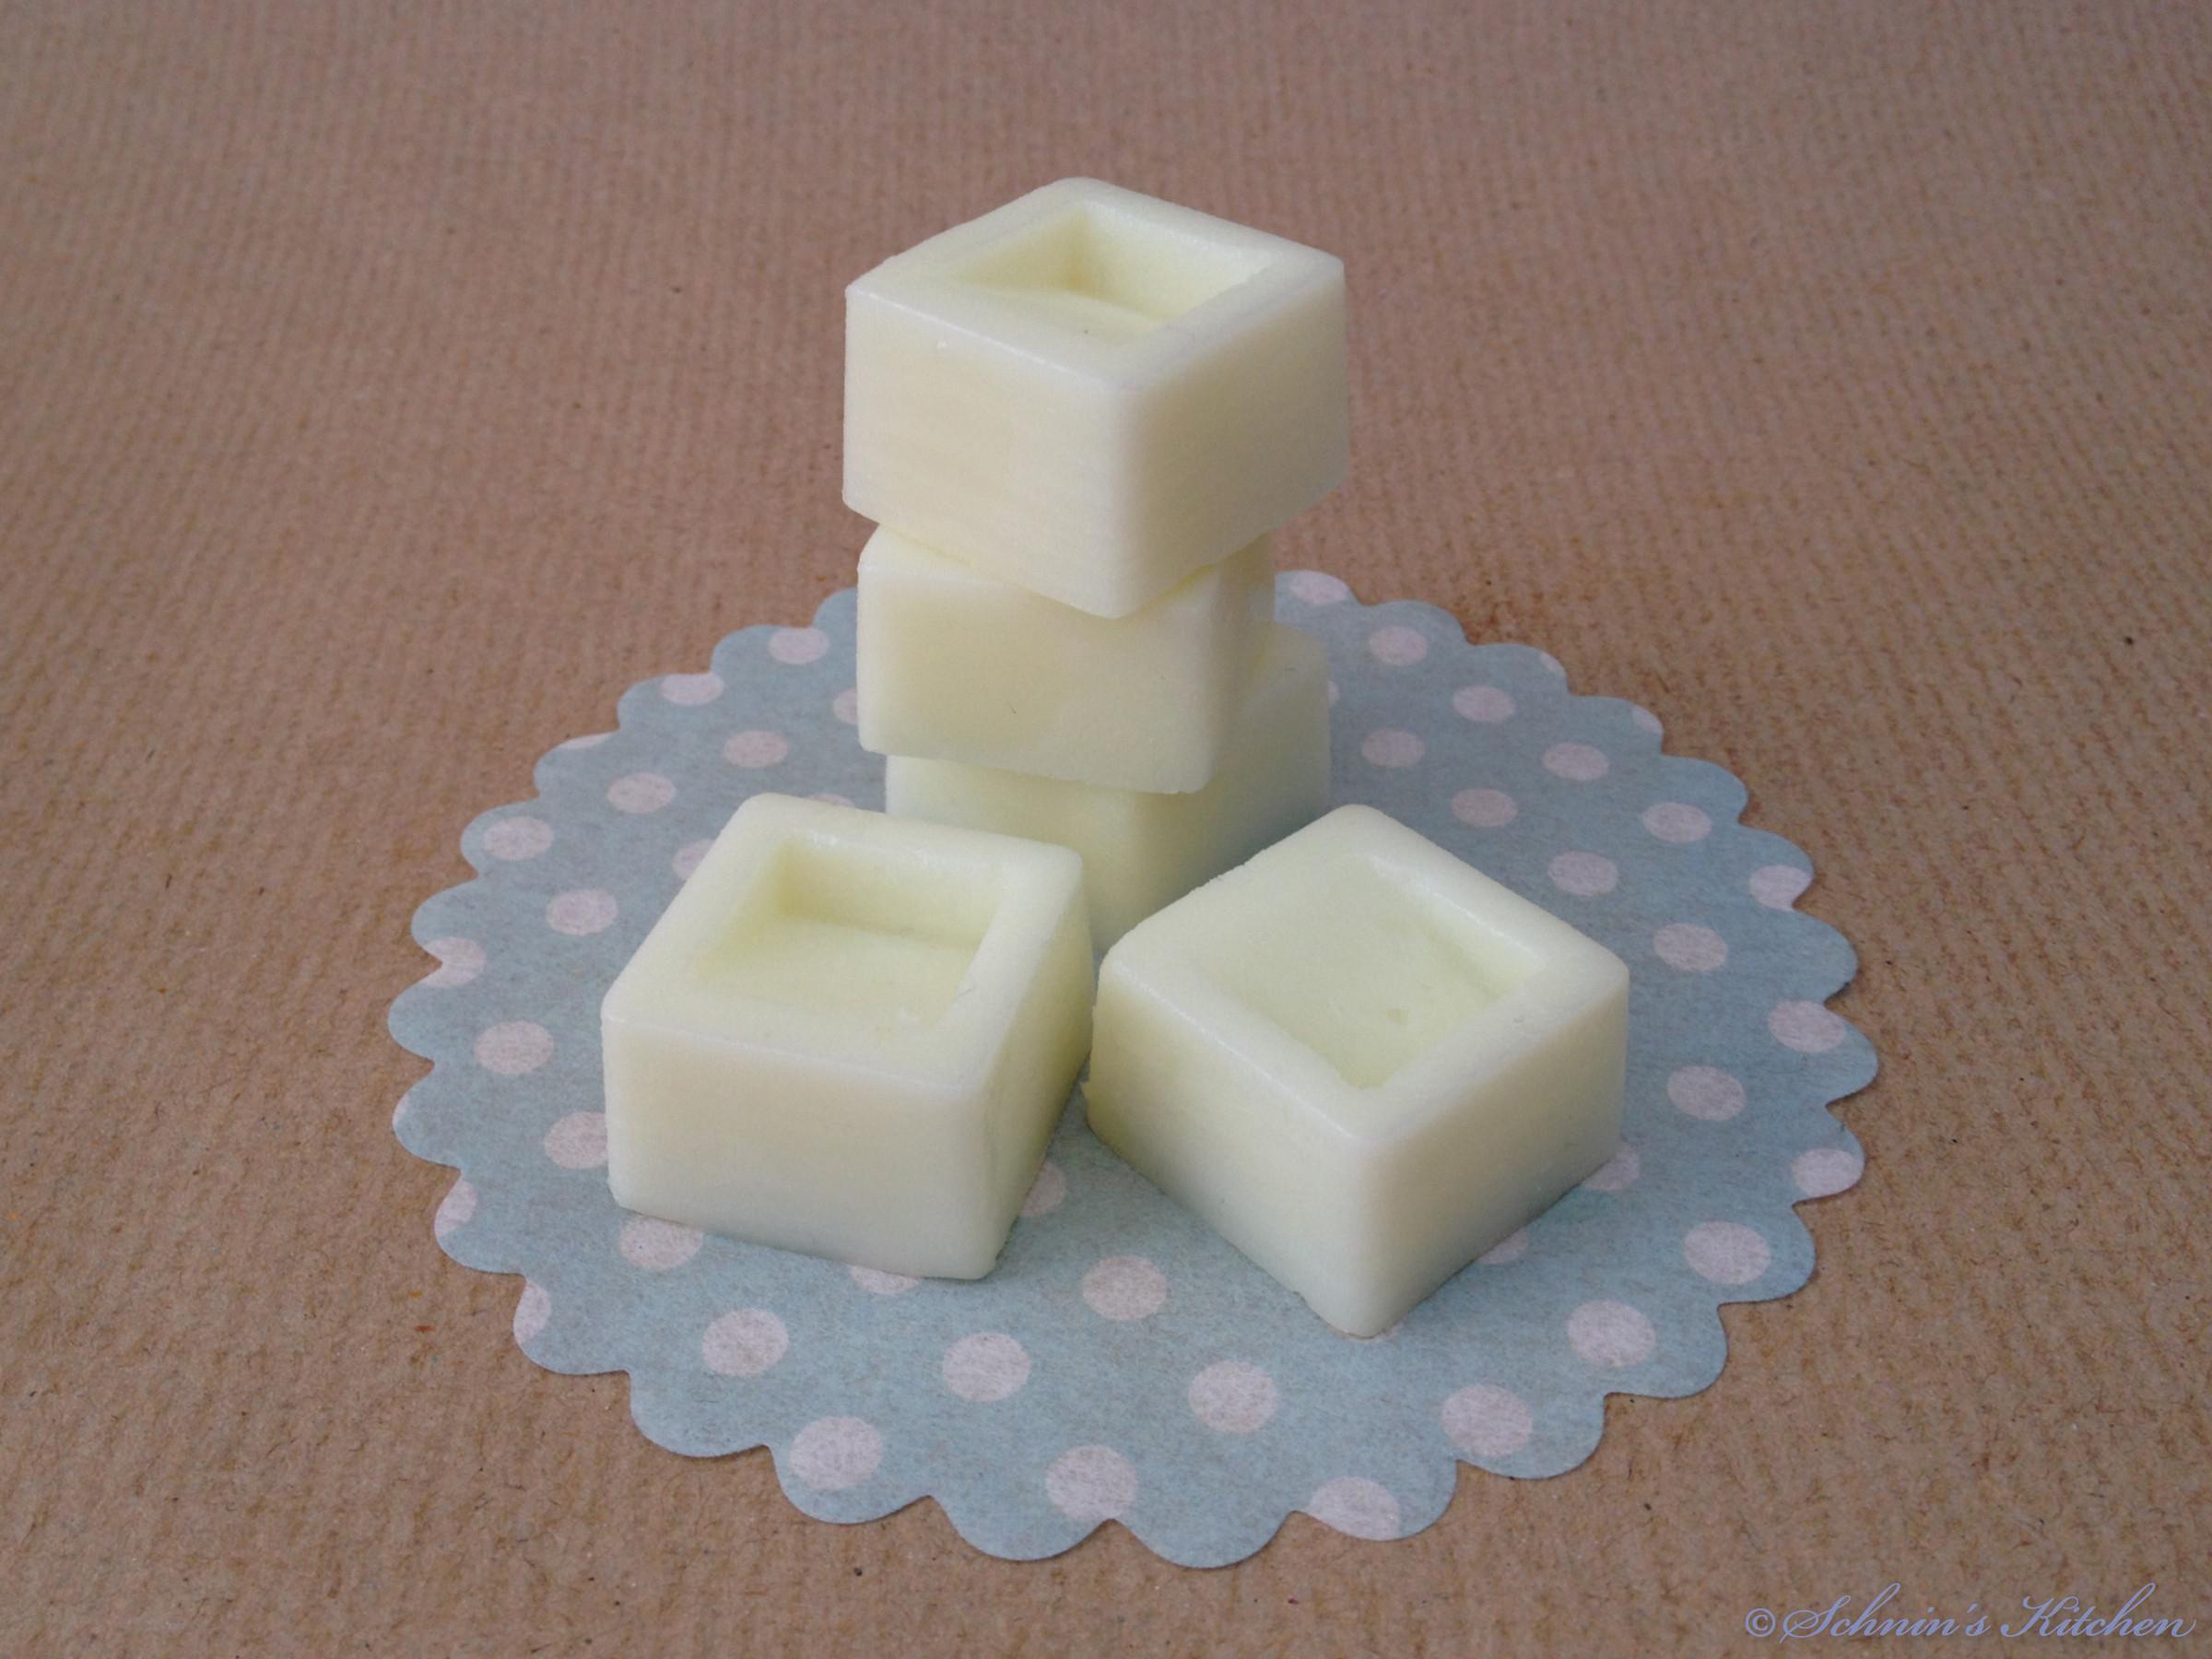 Diy Kosmetik  DIY Kosmetik Body Butter Lotion Bars alias Bodylotion am